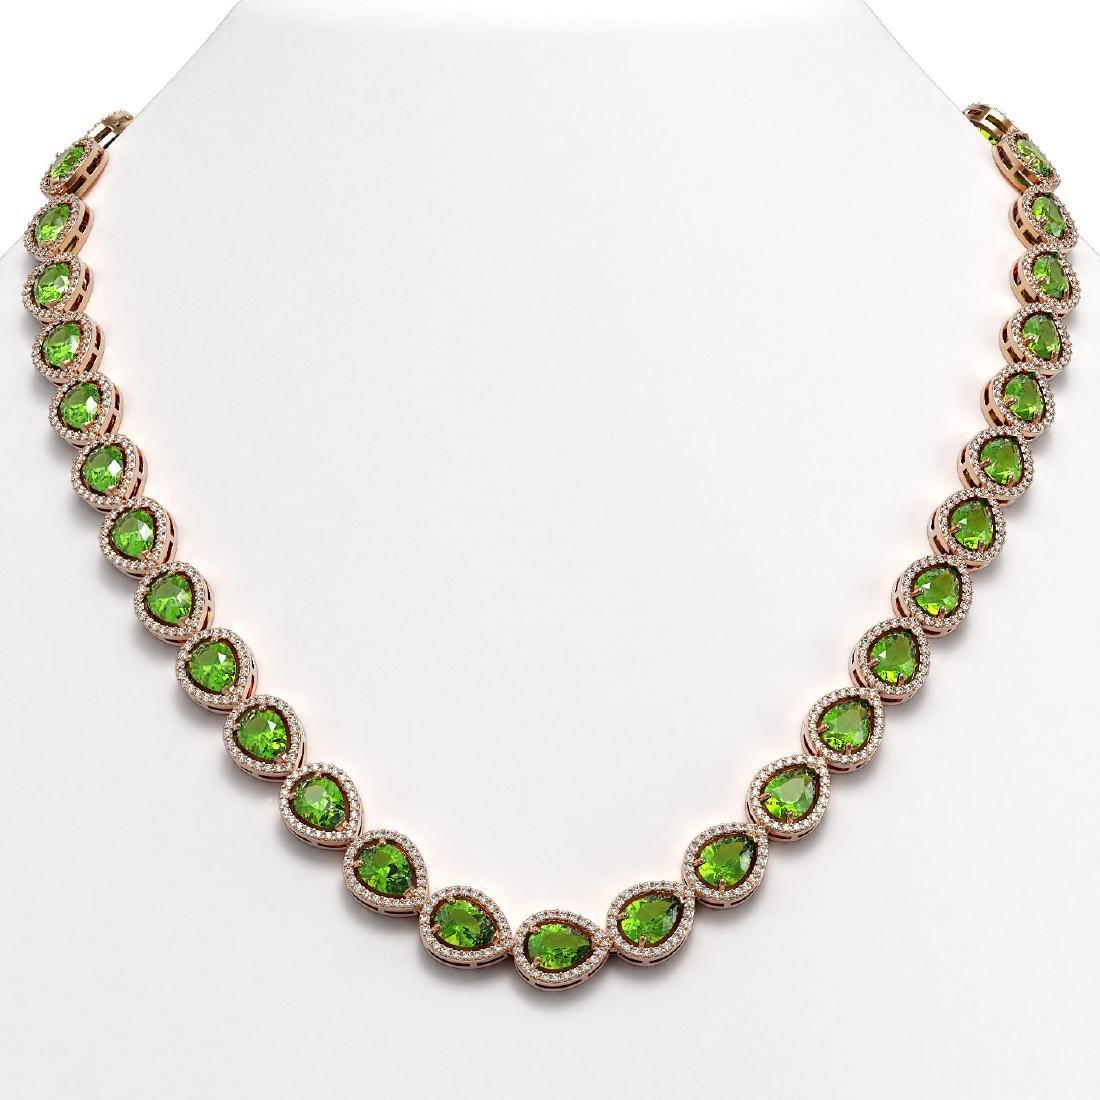 33.35 CTW Peridot & Diamond Halo Necklace 10K Rose Gold